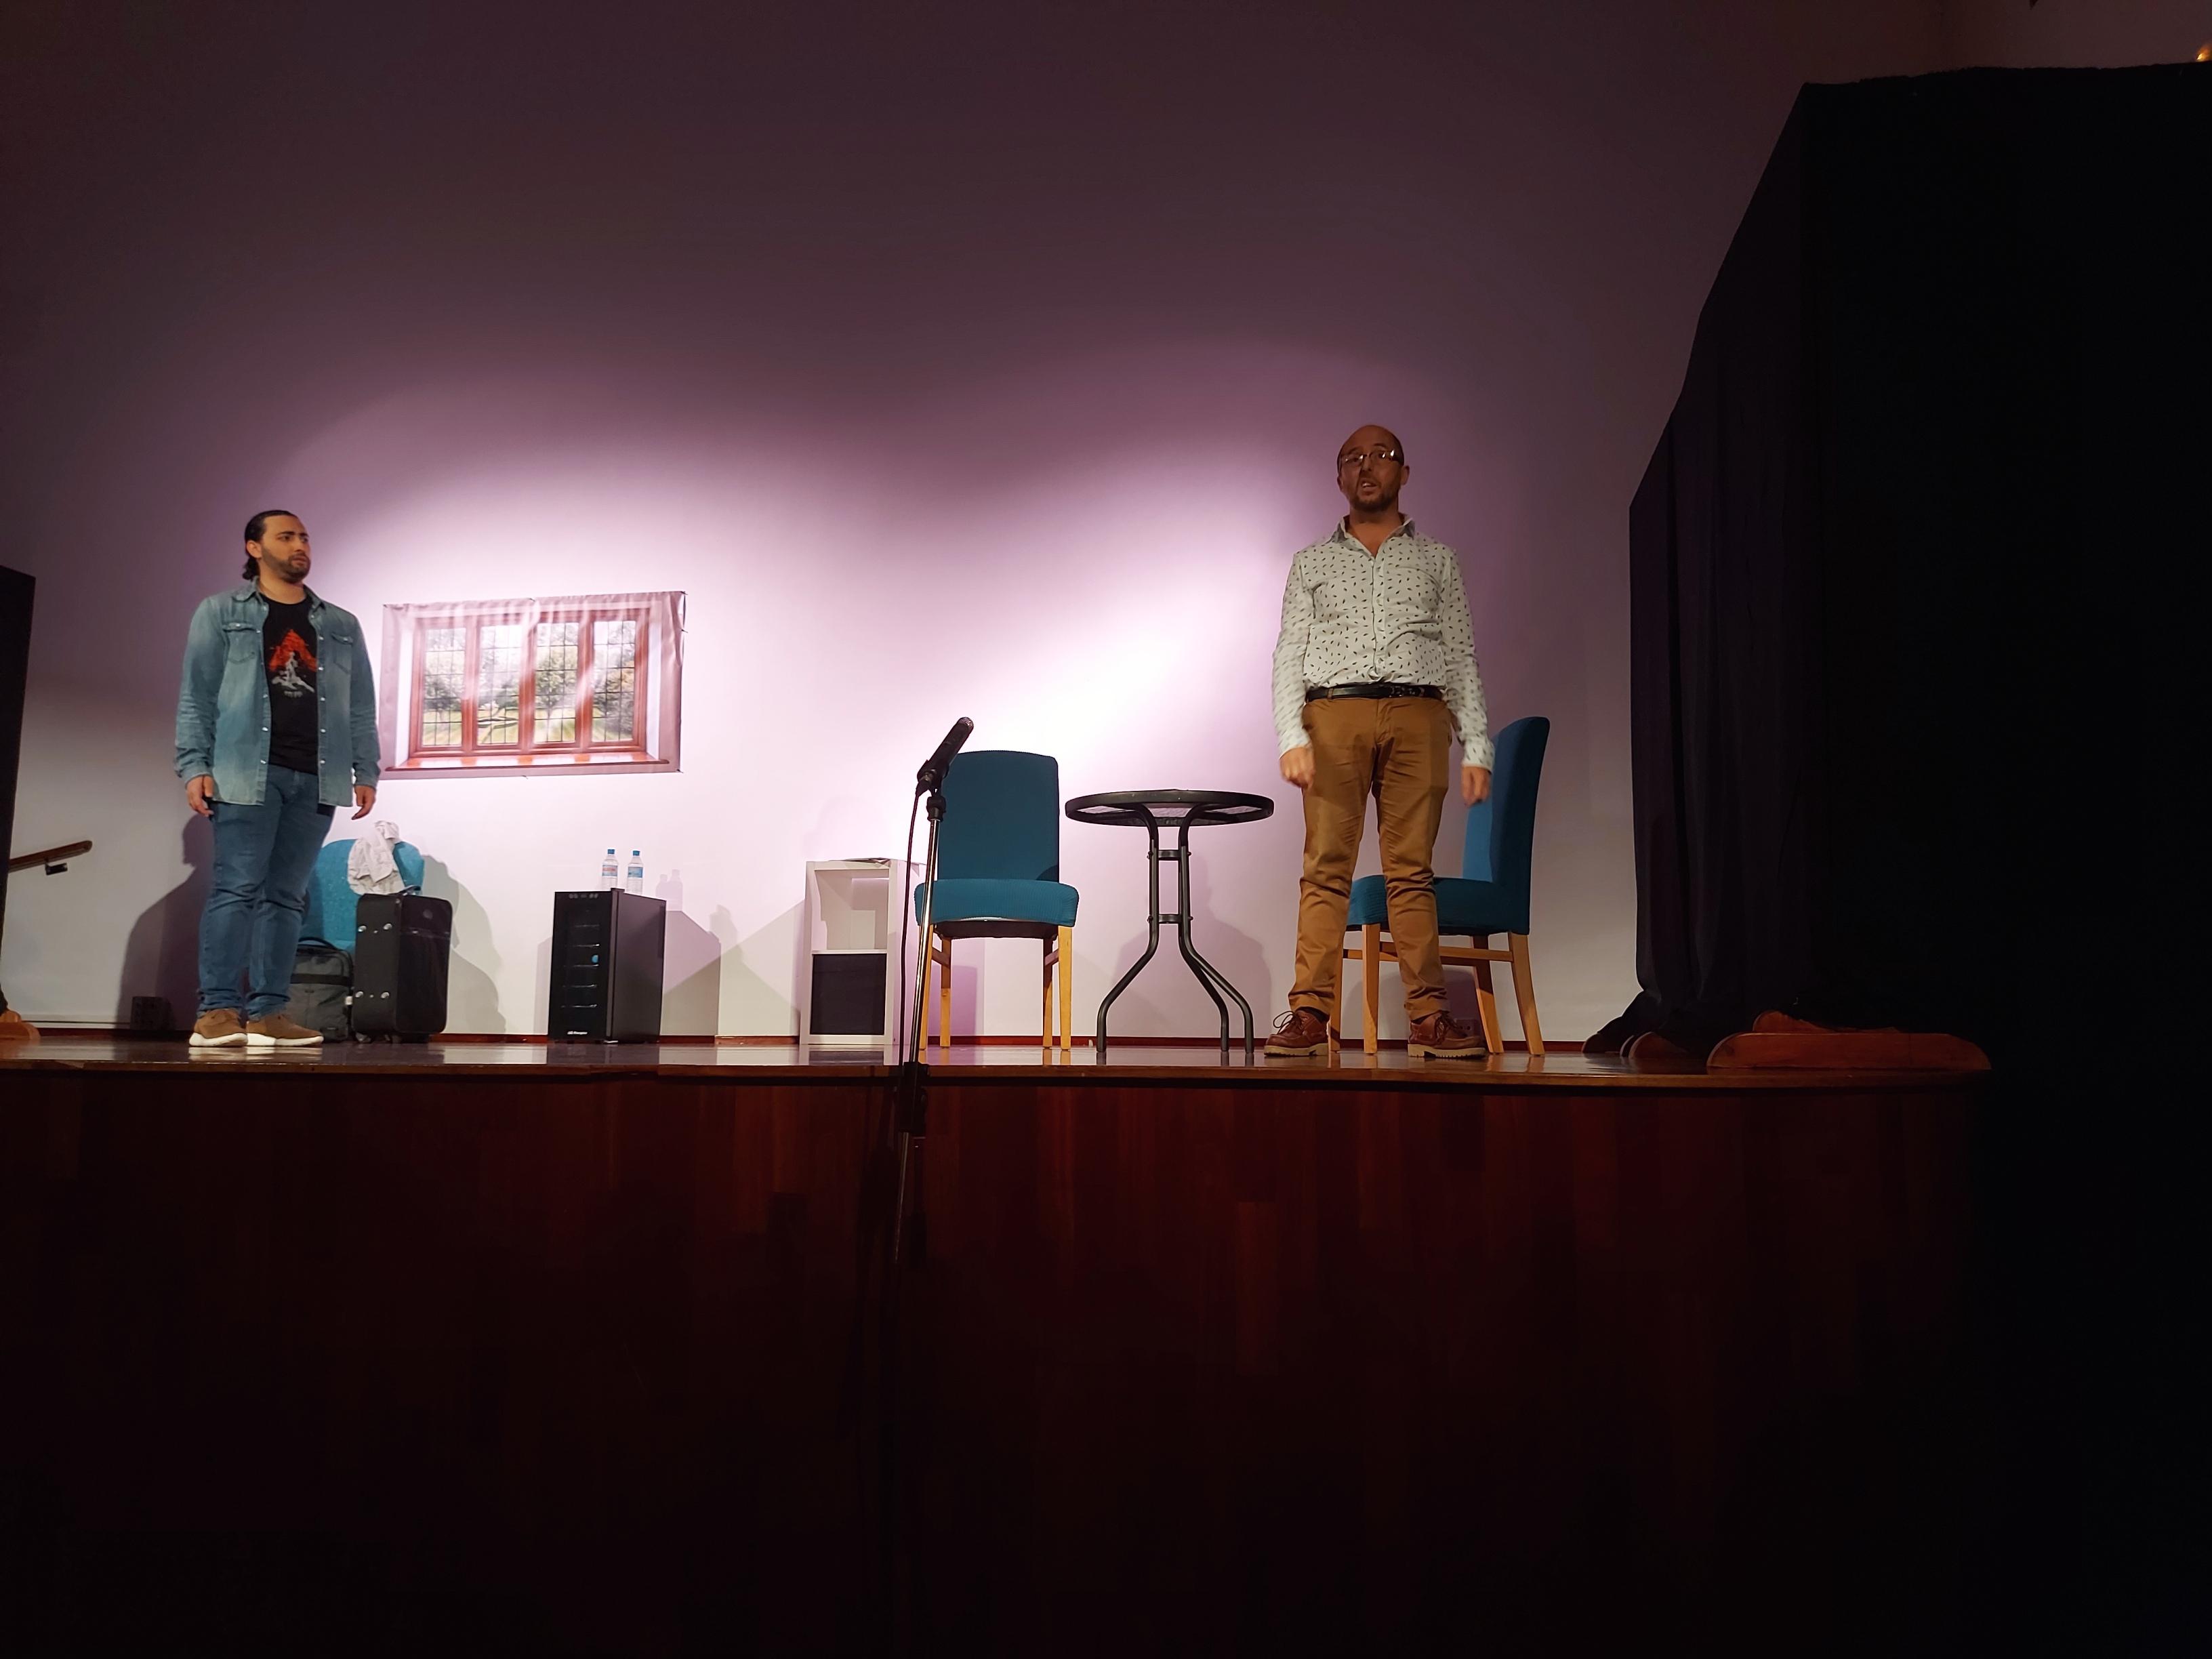 20210422190629_happened_61_teatro-laberinto-de-crisol-teatro-12.jpg